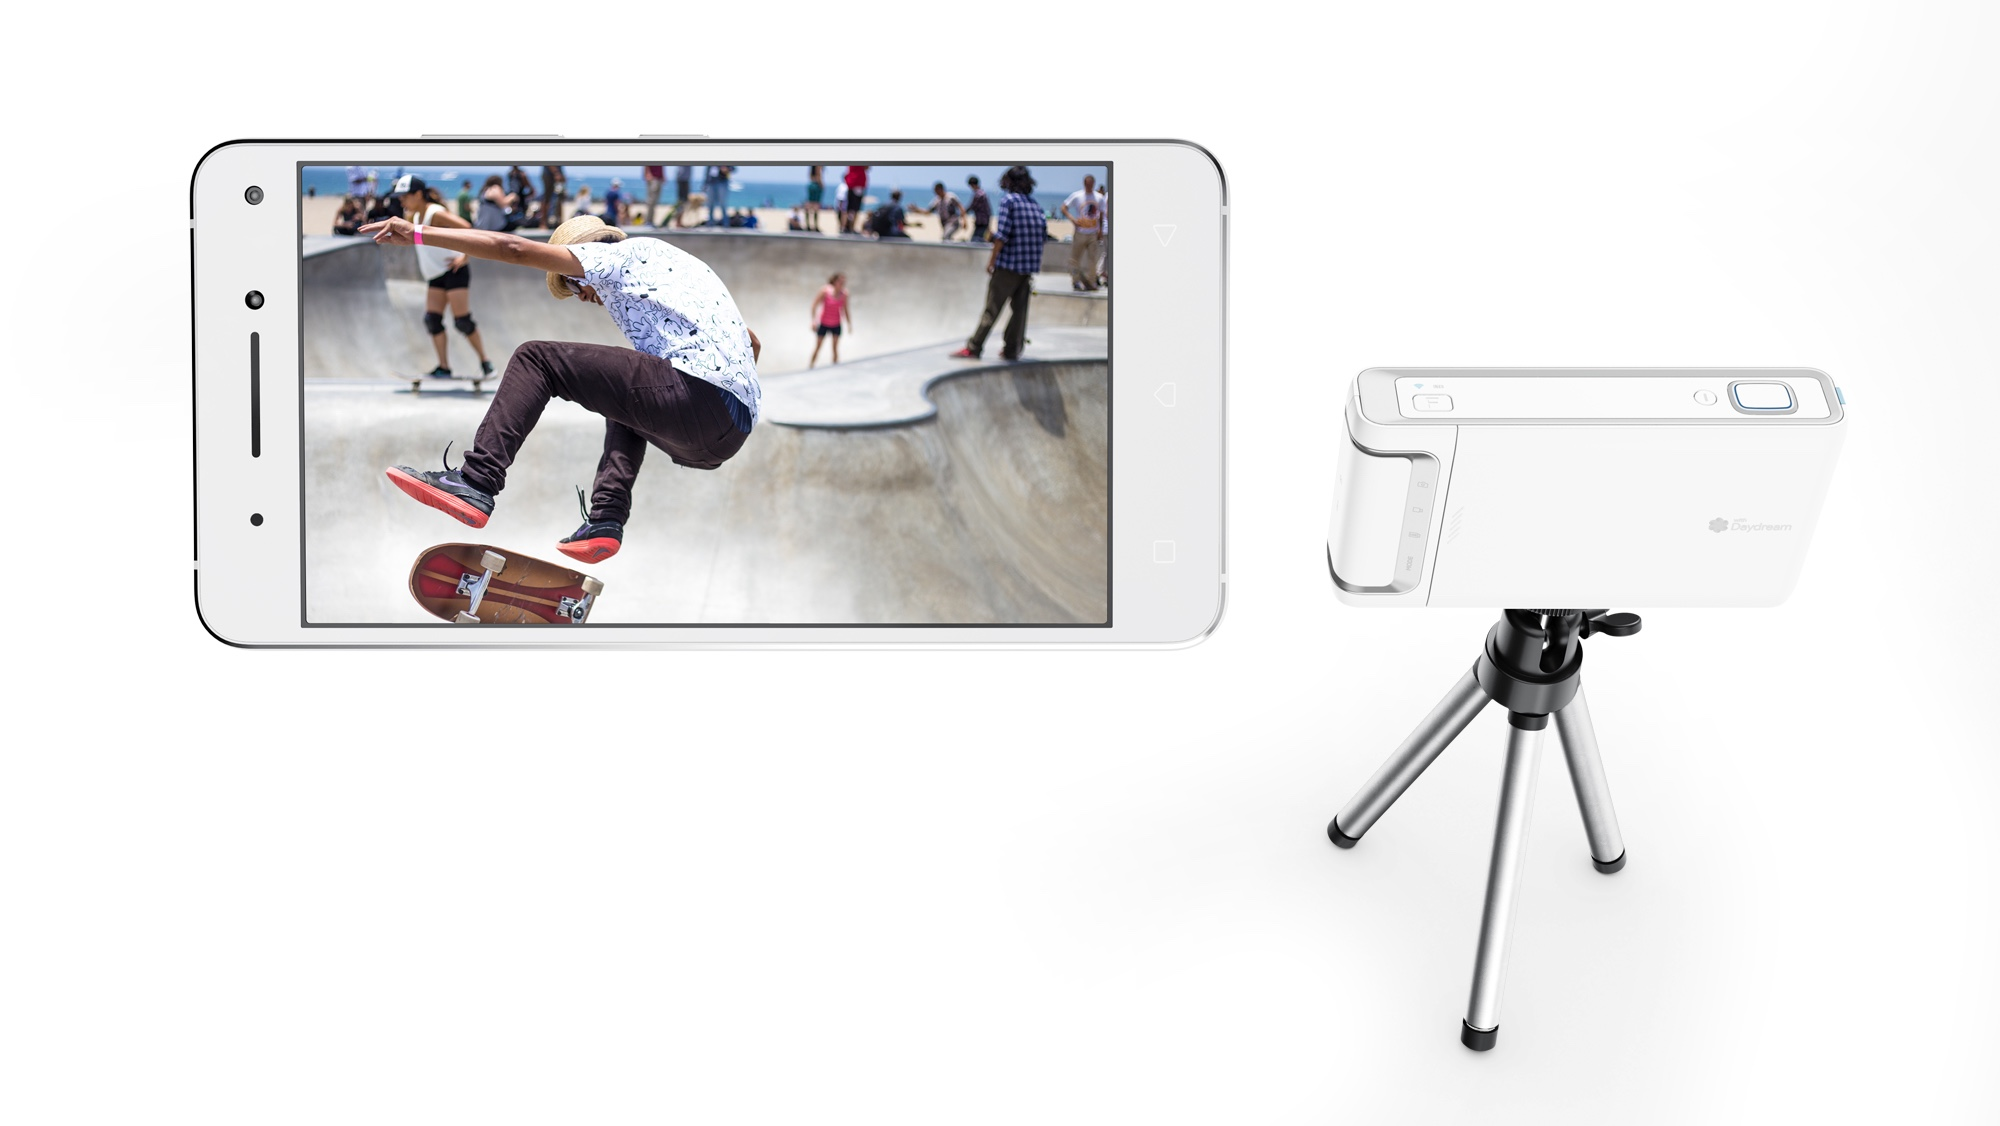 Lenovo Mirage Camera for YouTube VR streaming